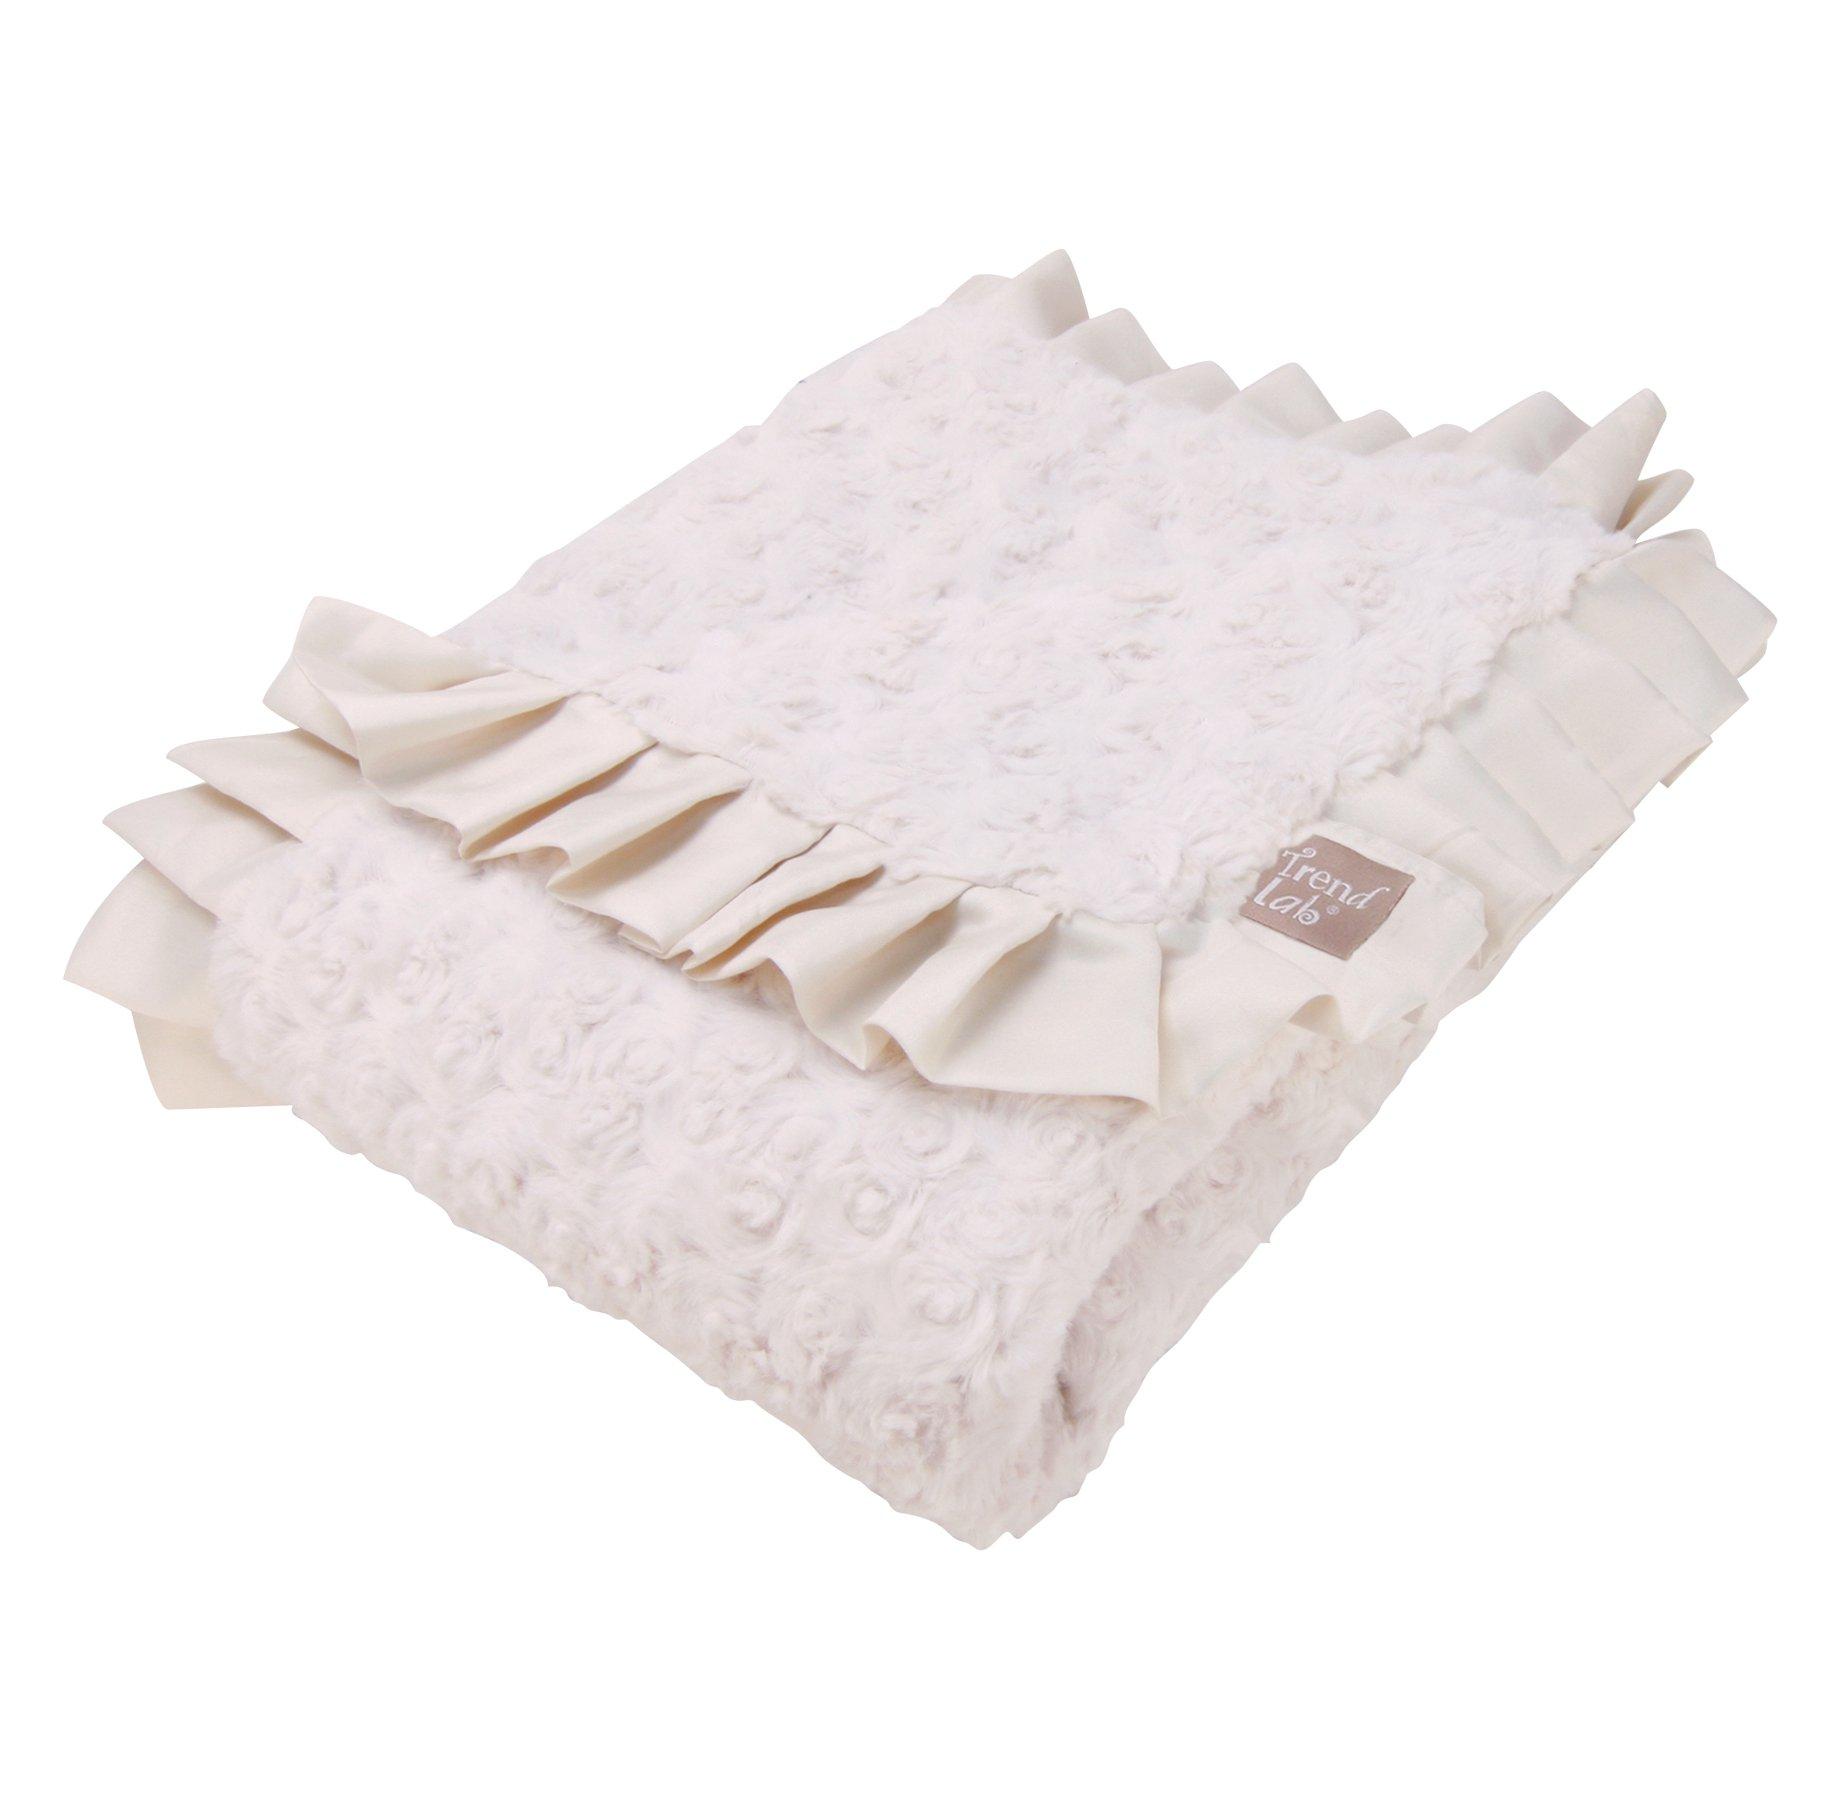 Trend Lab Velour Ruffle Trimmed Receiving Blanket, Cream